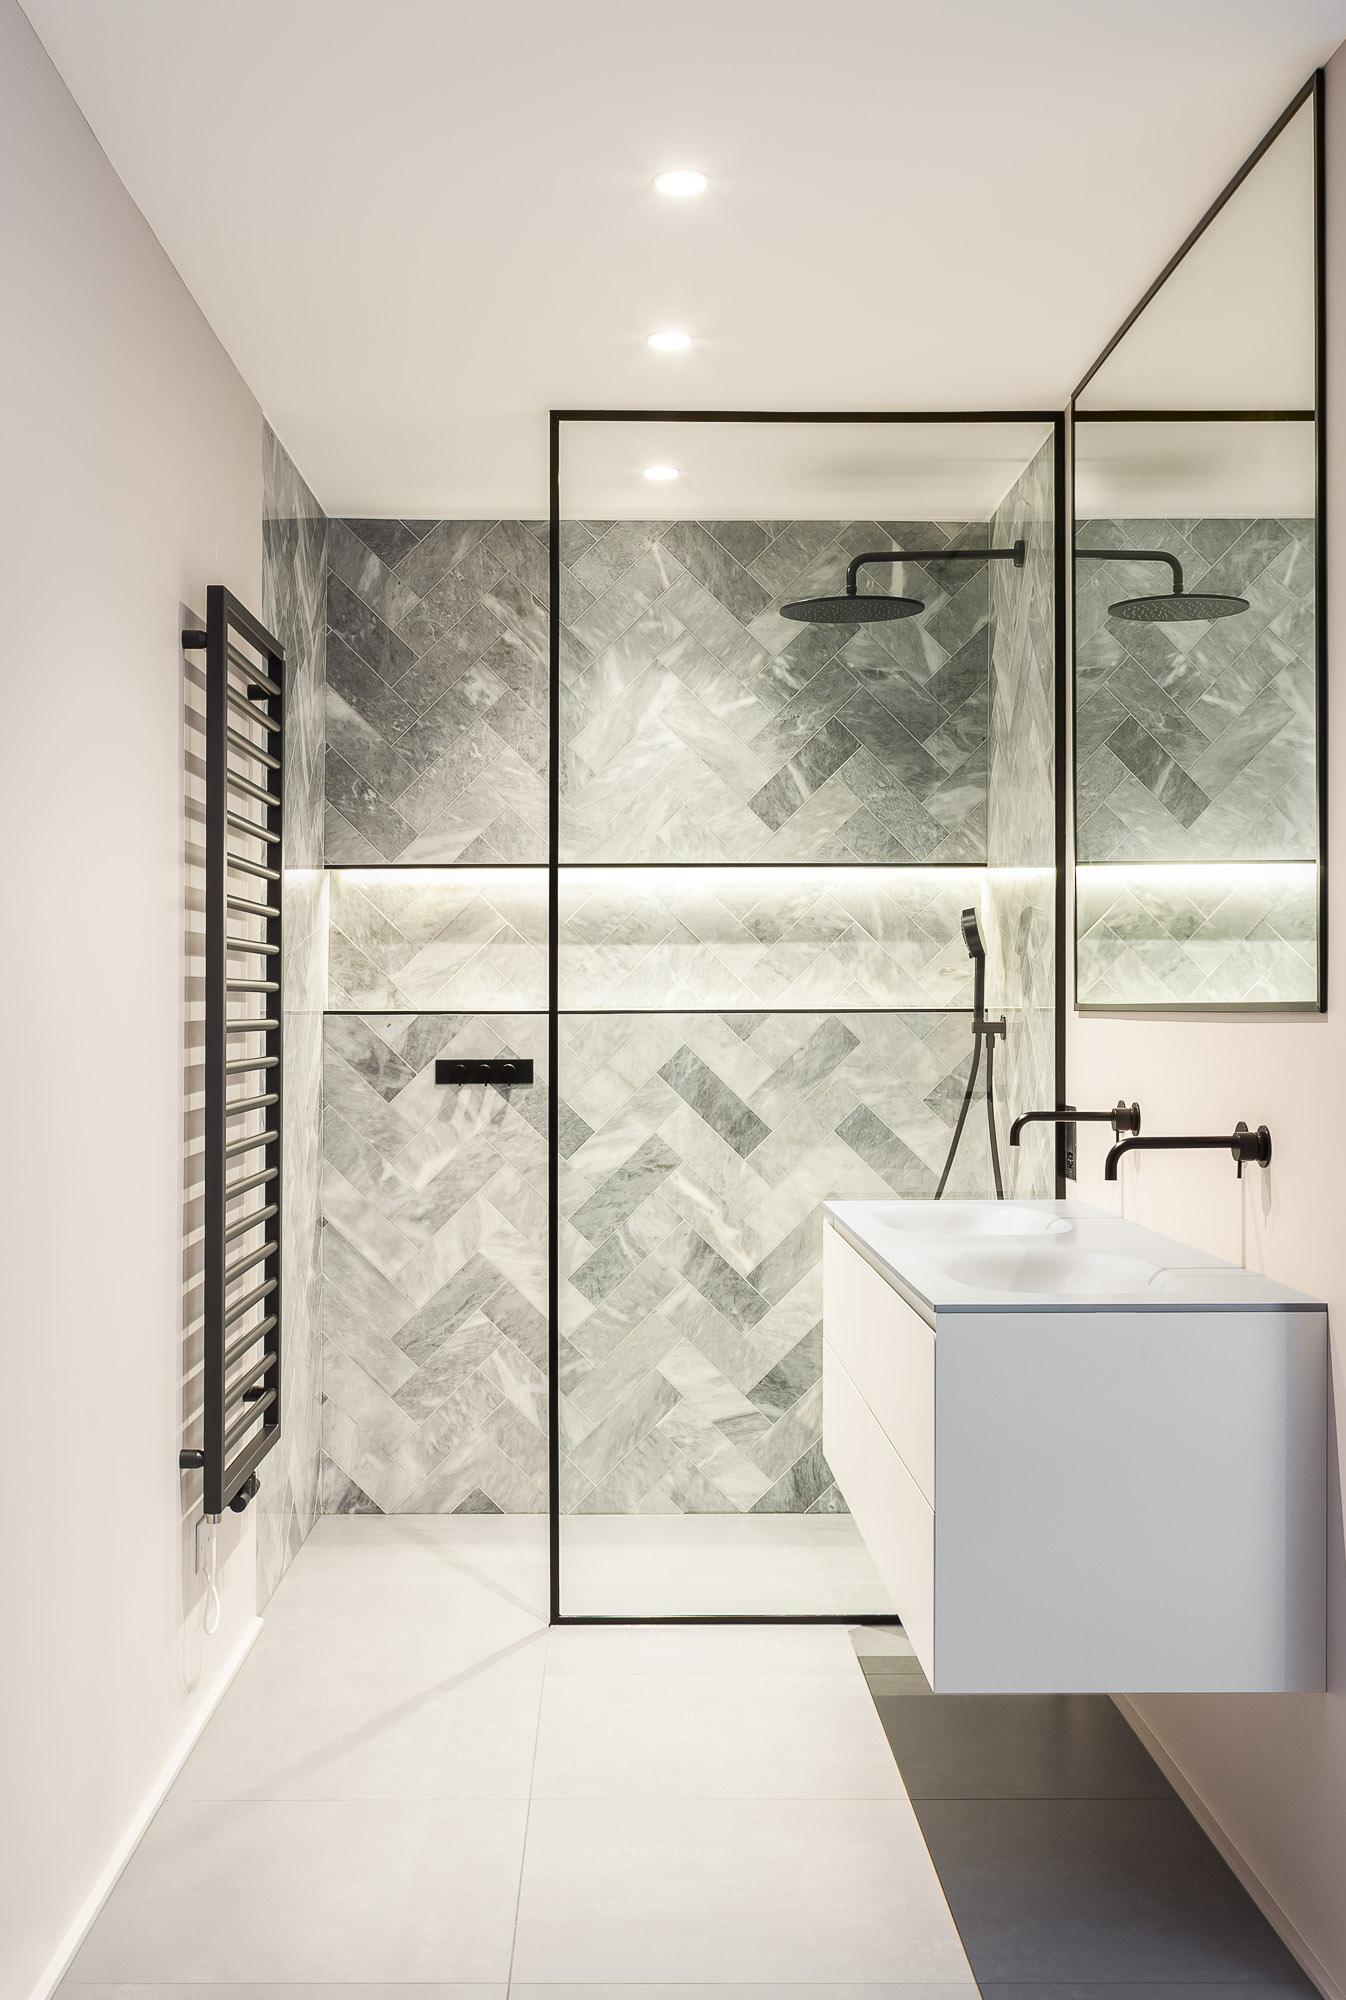 Fulham-Master-Bedroom-Suite-Refurbishment-London-Bathroom.jpg